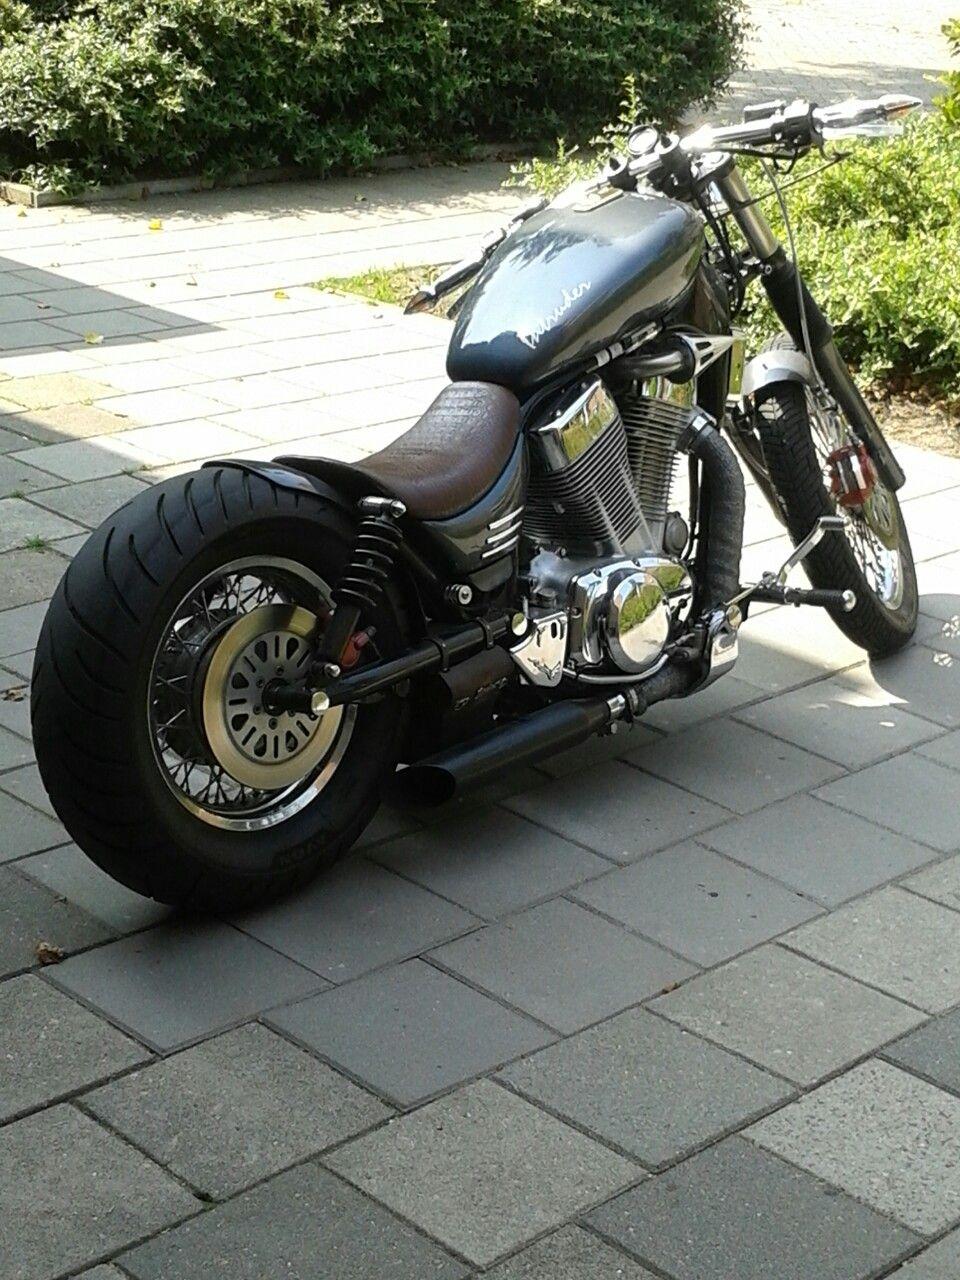 Intruder 1400 Custom Built Suzuki Bobber & Chopper Bikes